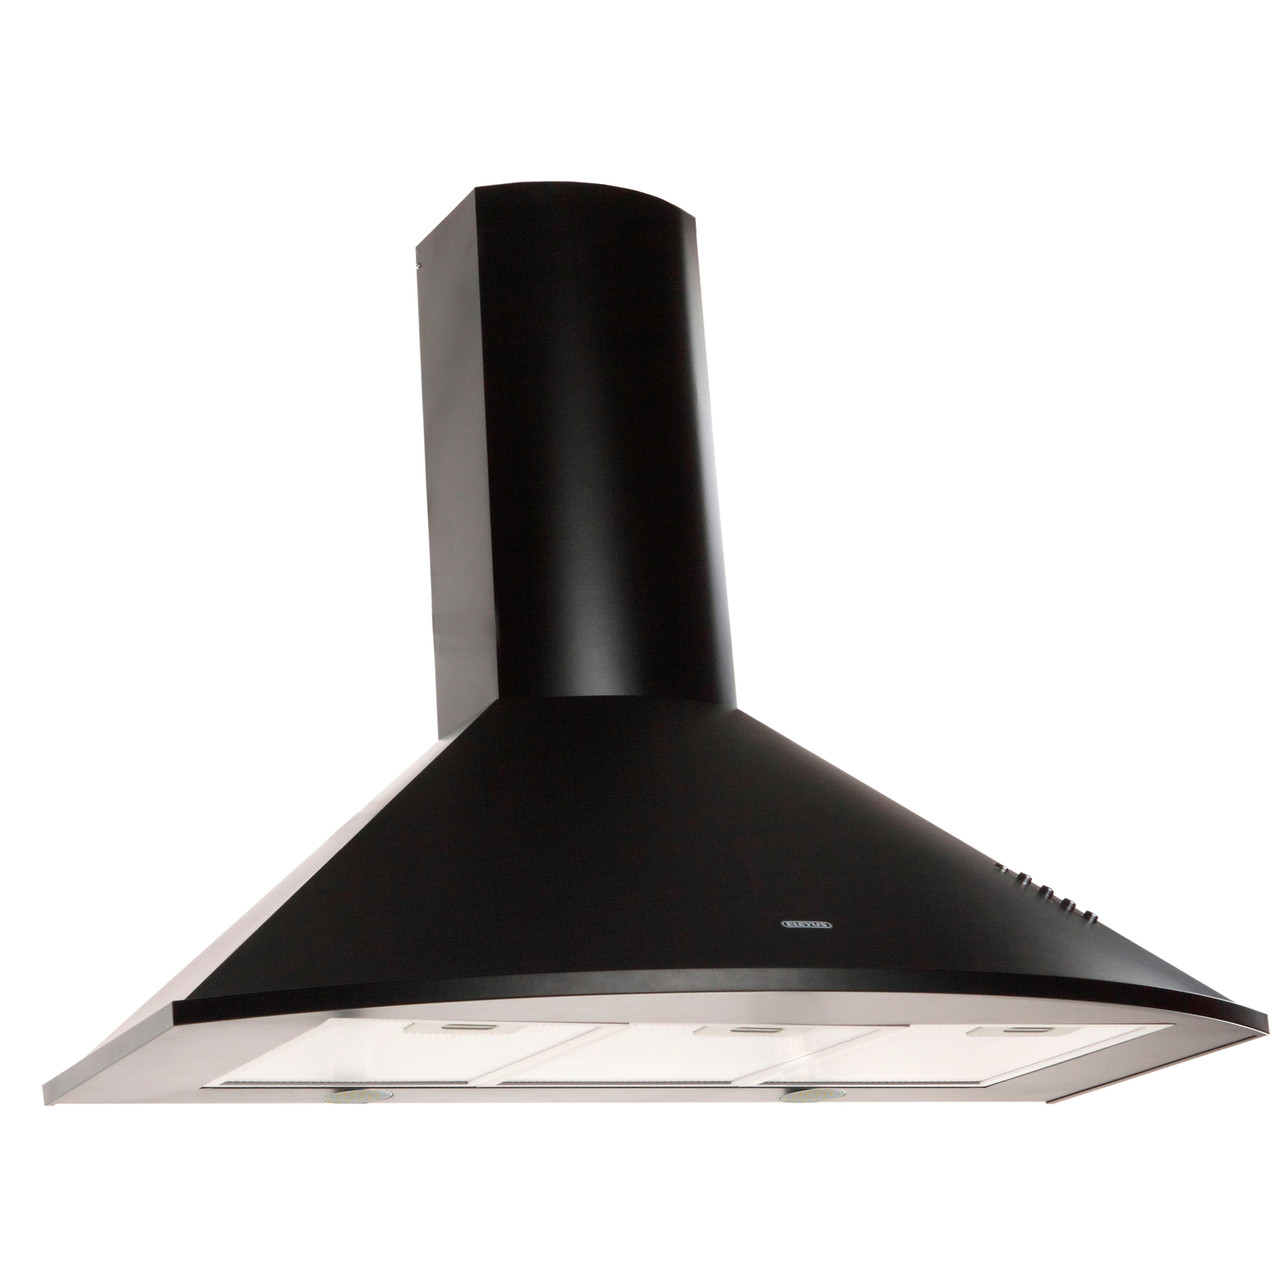 Витяжка кухонна ELEYUS Bora 1000 LED SMD 90 BL